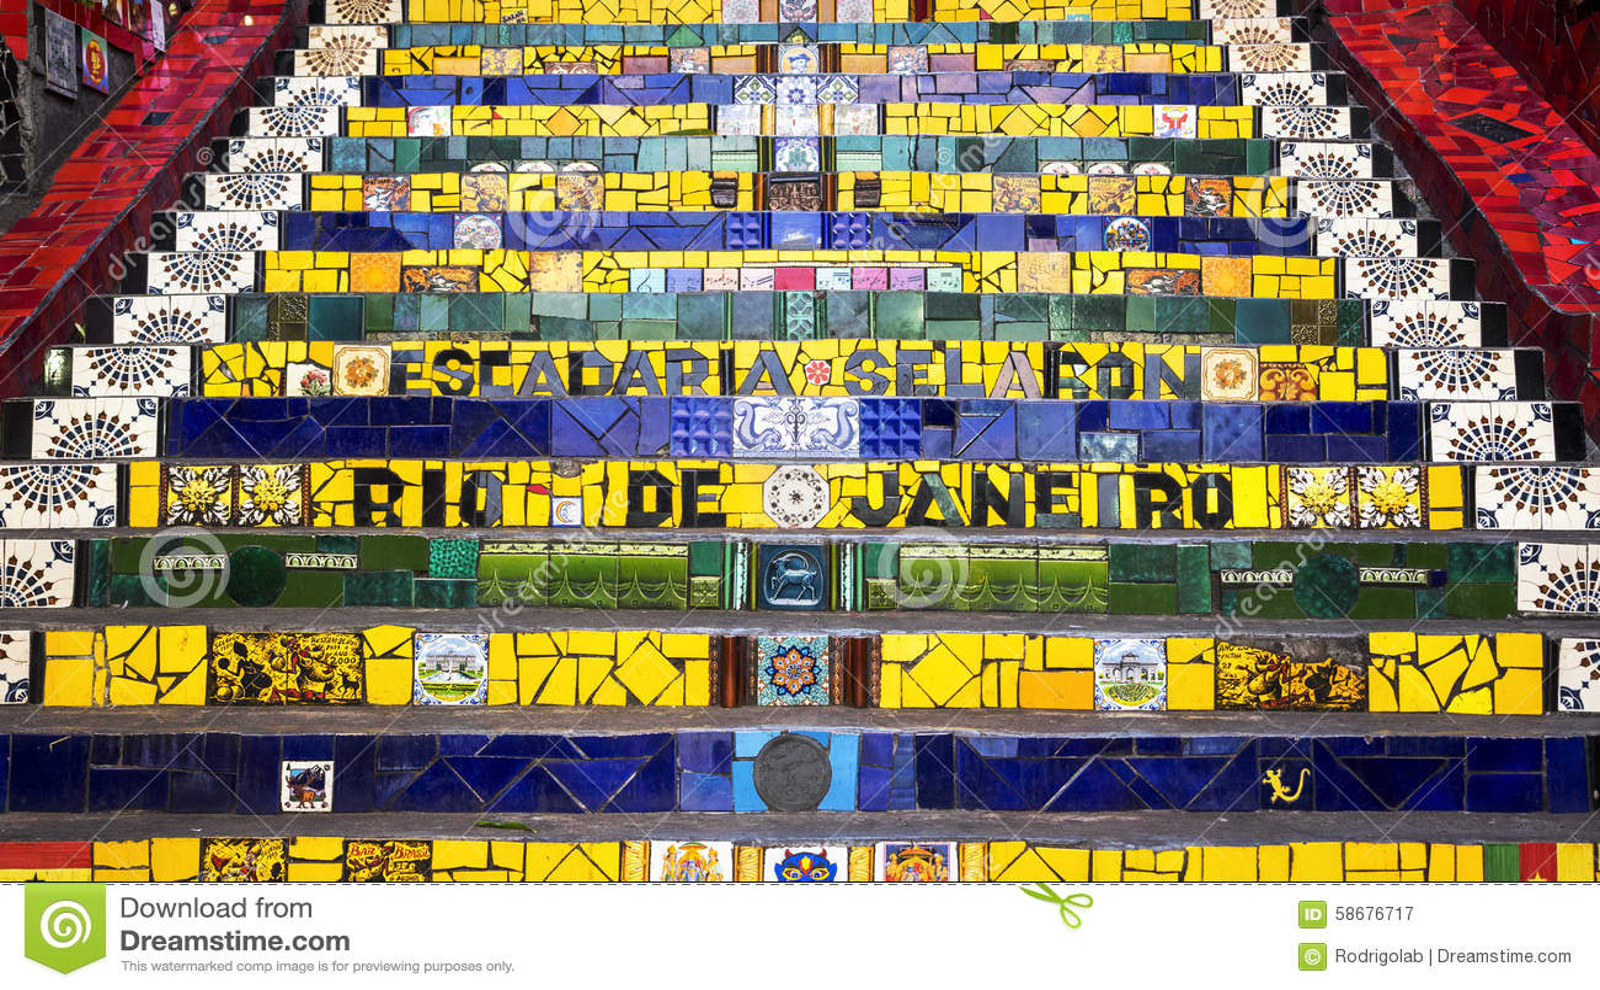 Download Escadaria Selaron, Or Lapa Steps, In Rio De Janeiro, Brazil Stock Image - Image of famous, blue: 58676717